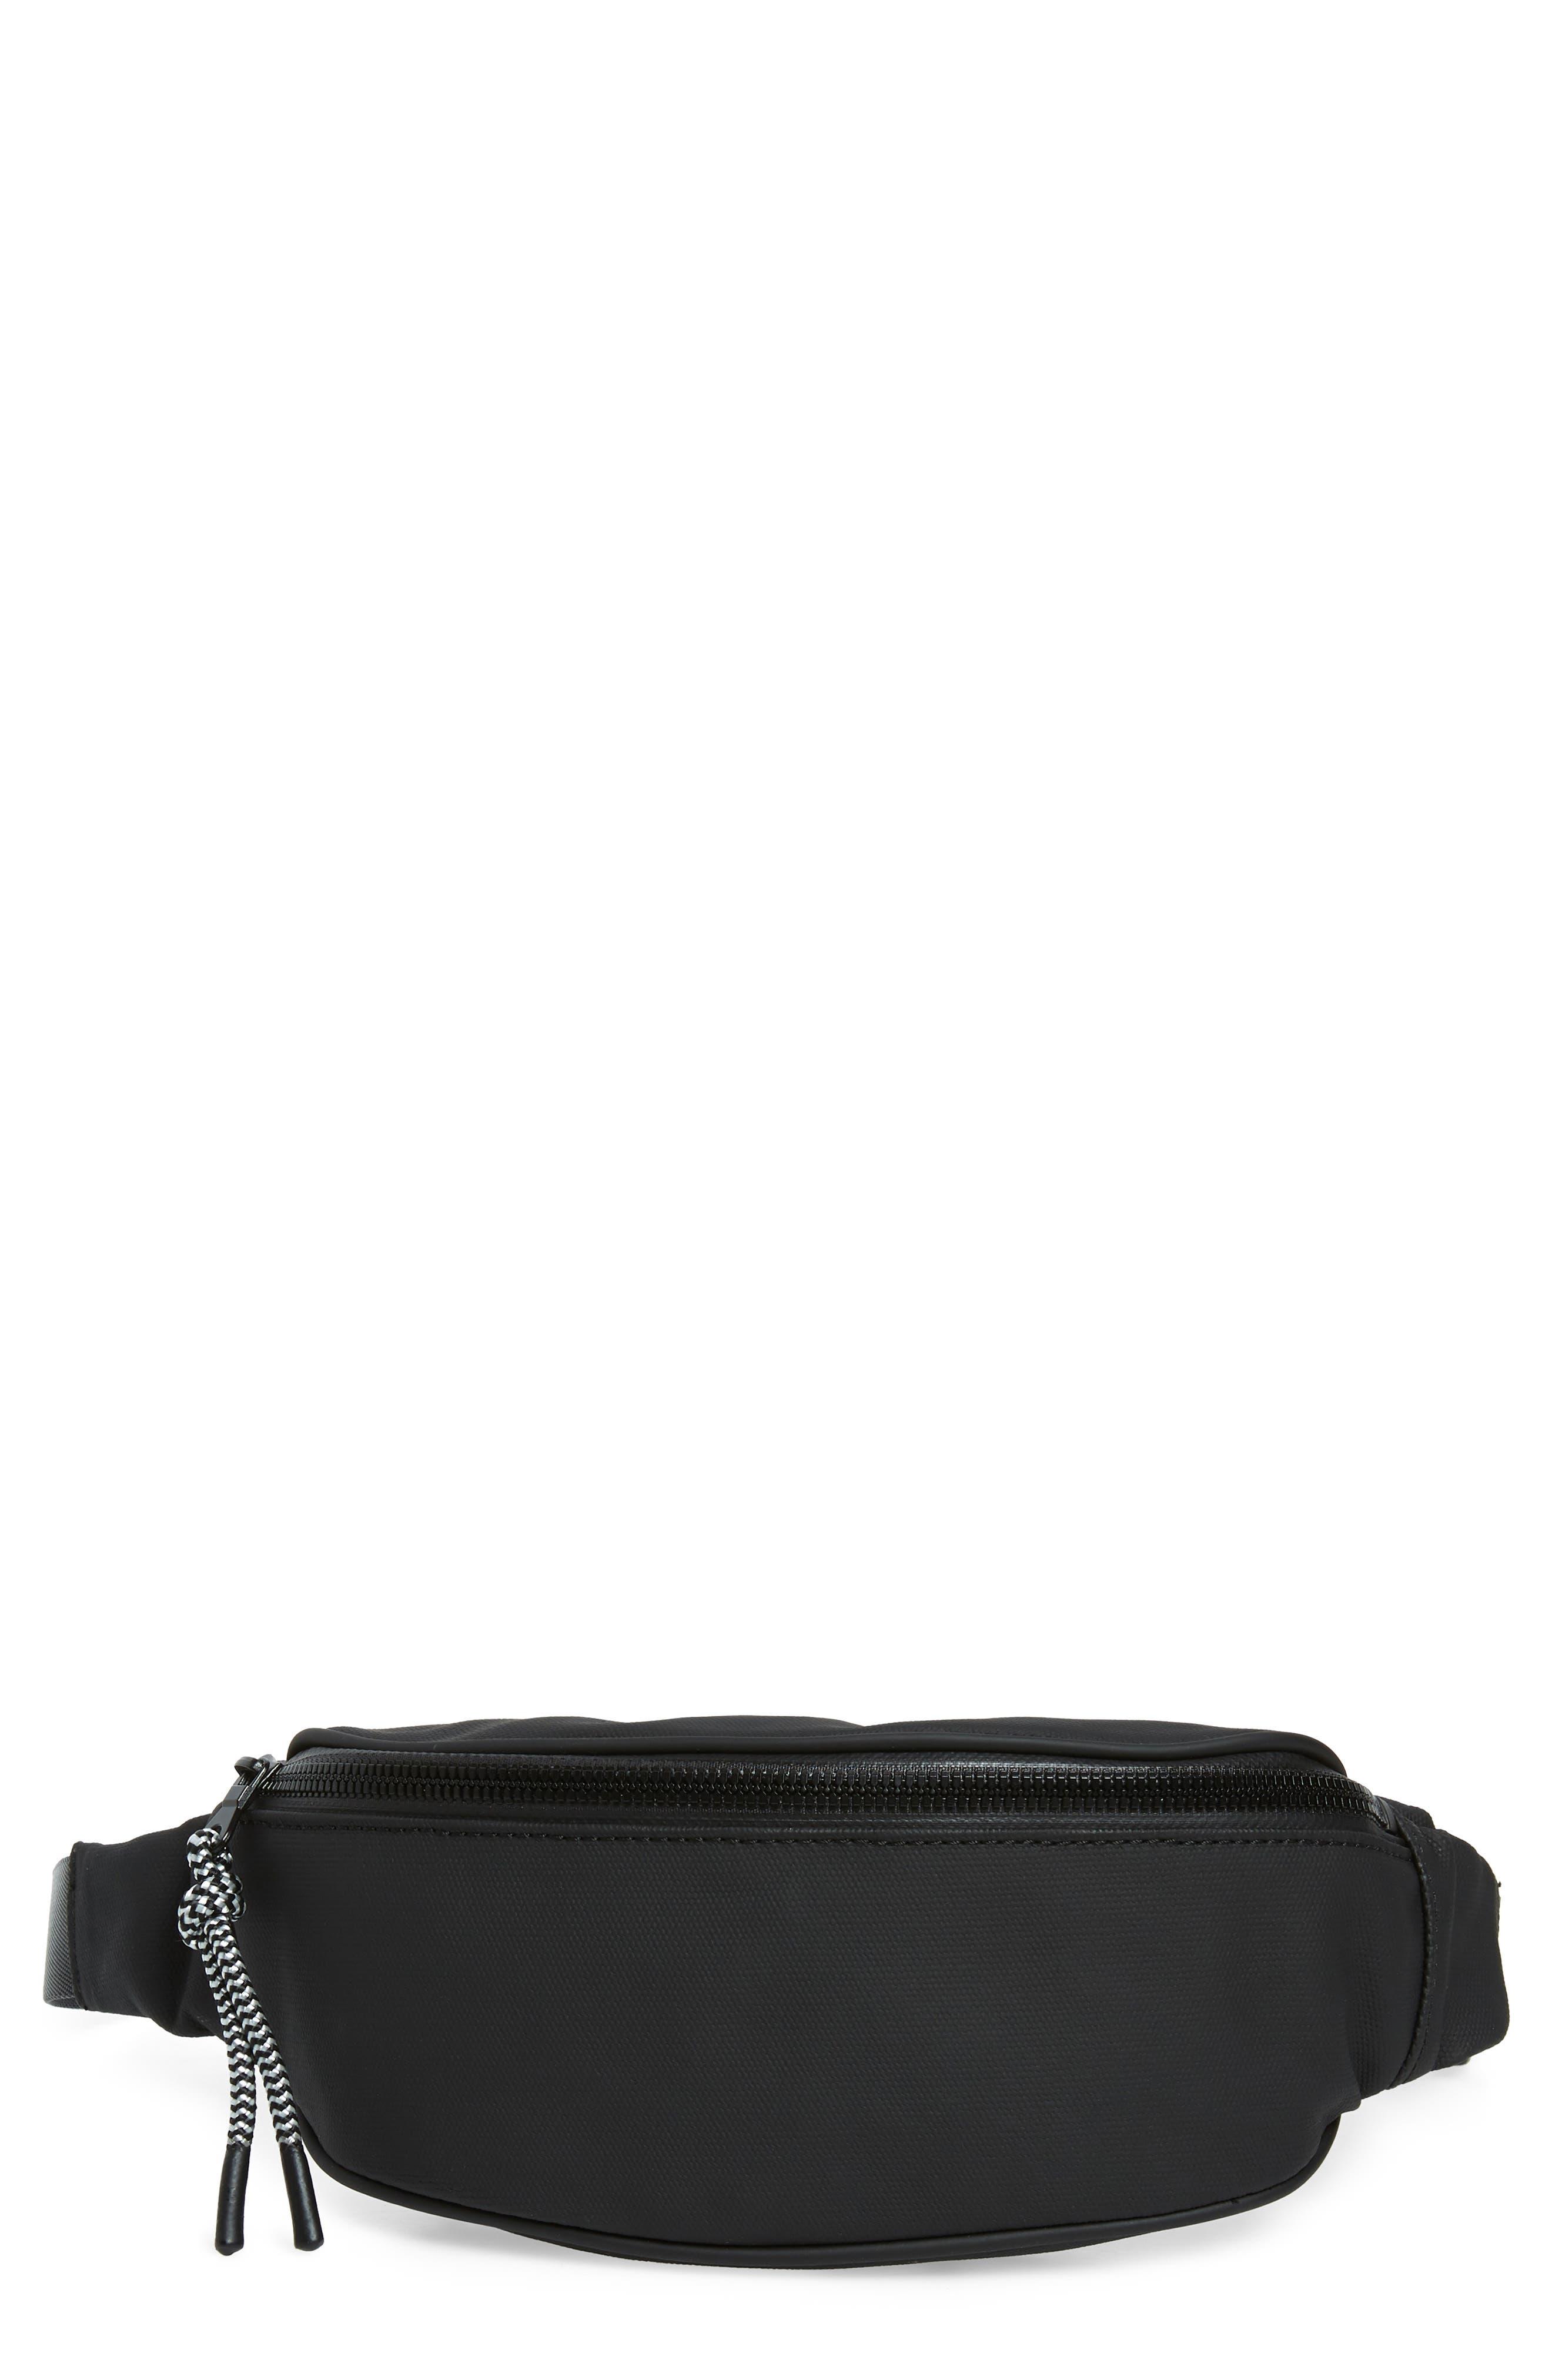 Mason Water Resistant Belt Bag,                             Main thumbnail 1, color,                             BLACK/ BLACK